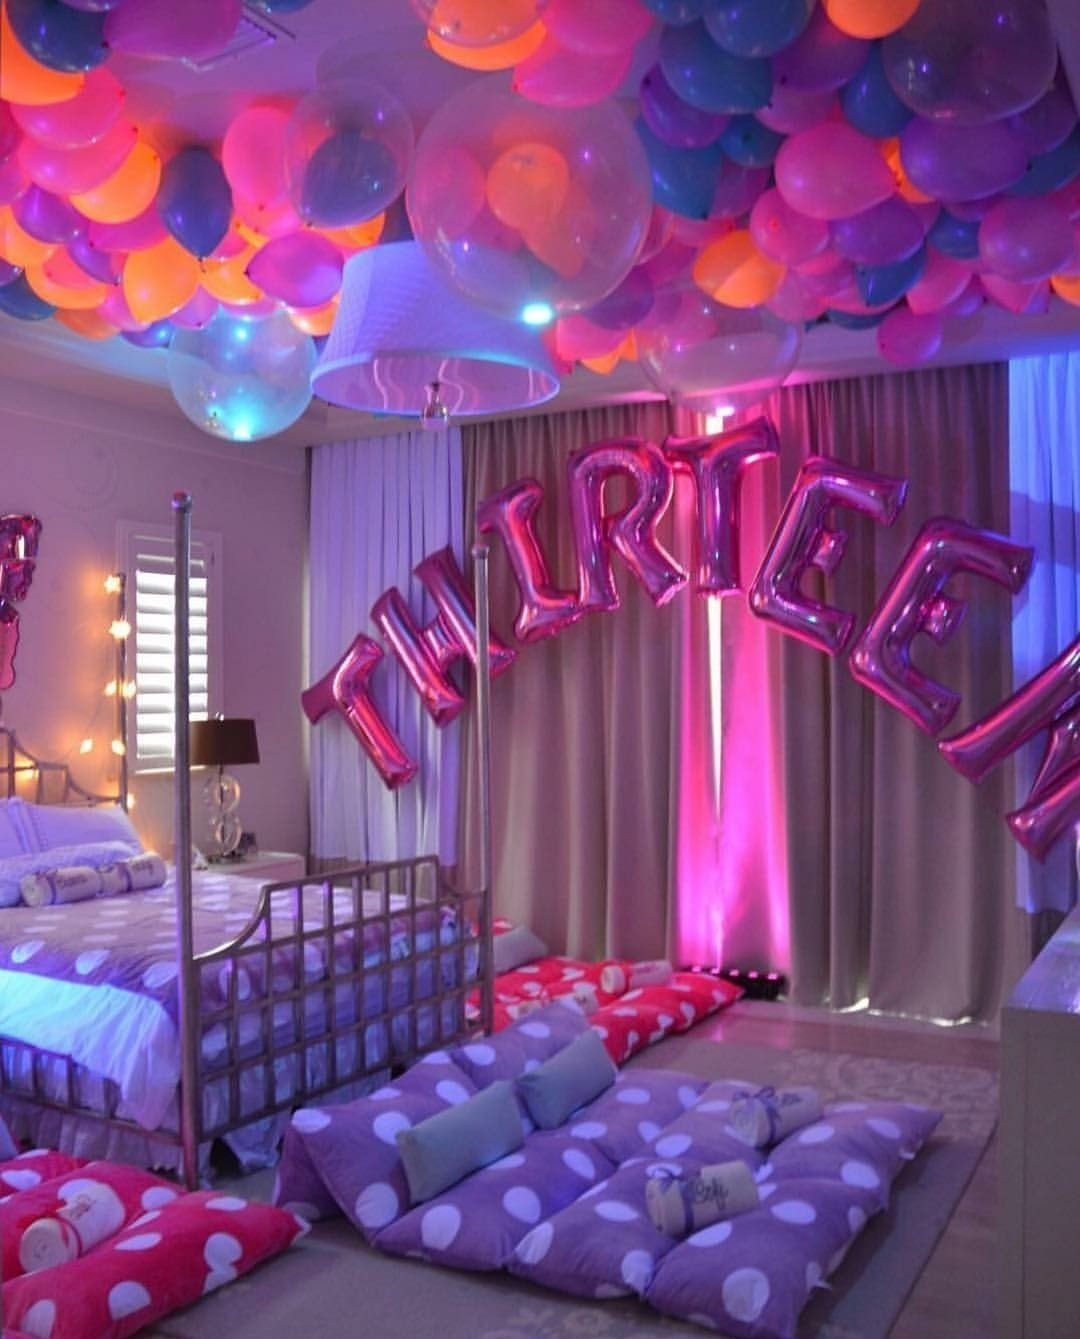 10 Awesome 13 Yr Old Birthday Party Ideas pinti money on cah day pinterest birthdays sweet 16 6 2020